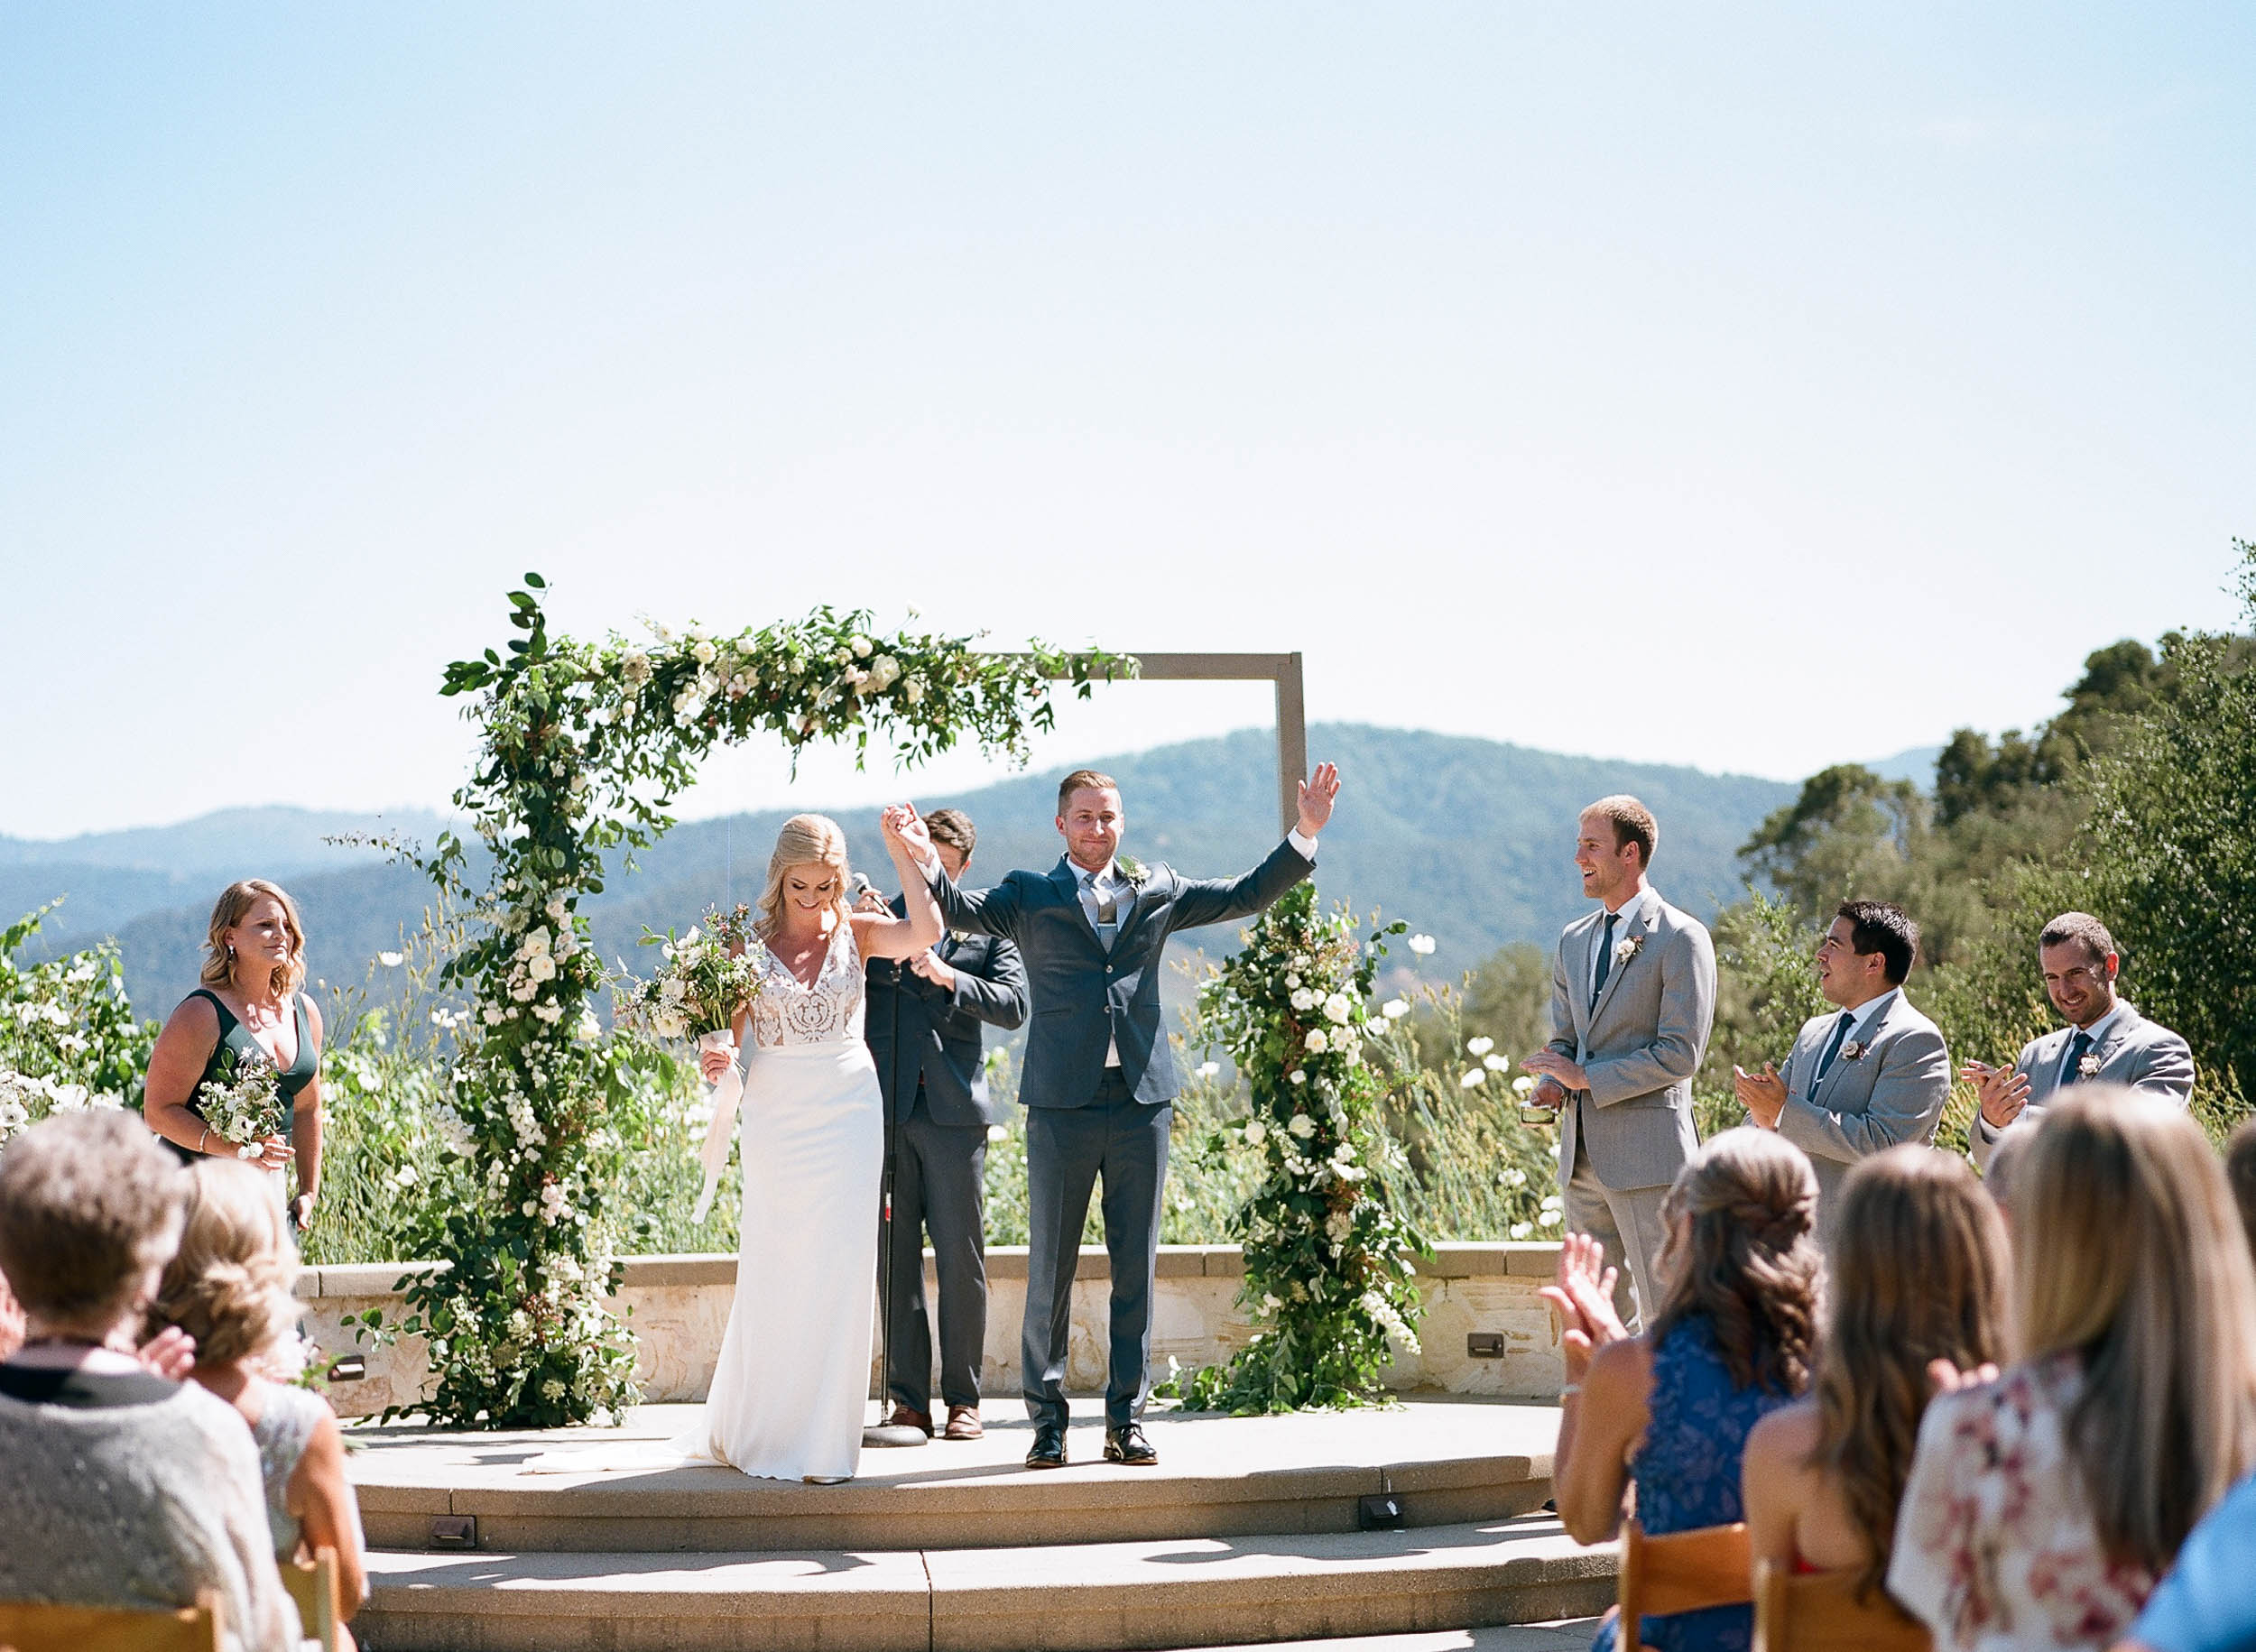 036_072118_D+K_Holman Ranch Wedding_Buena Lane Photography_00005433_13 copy.jpg